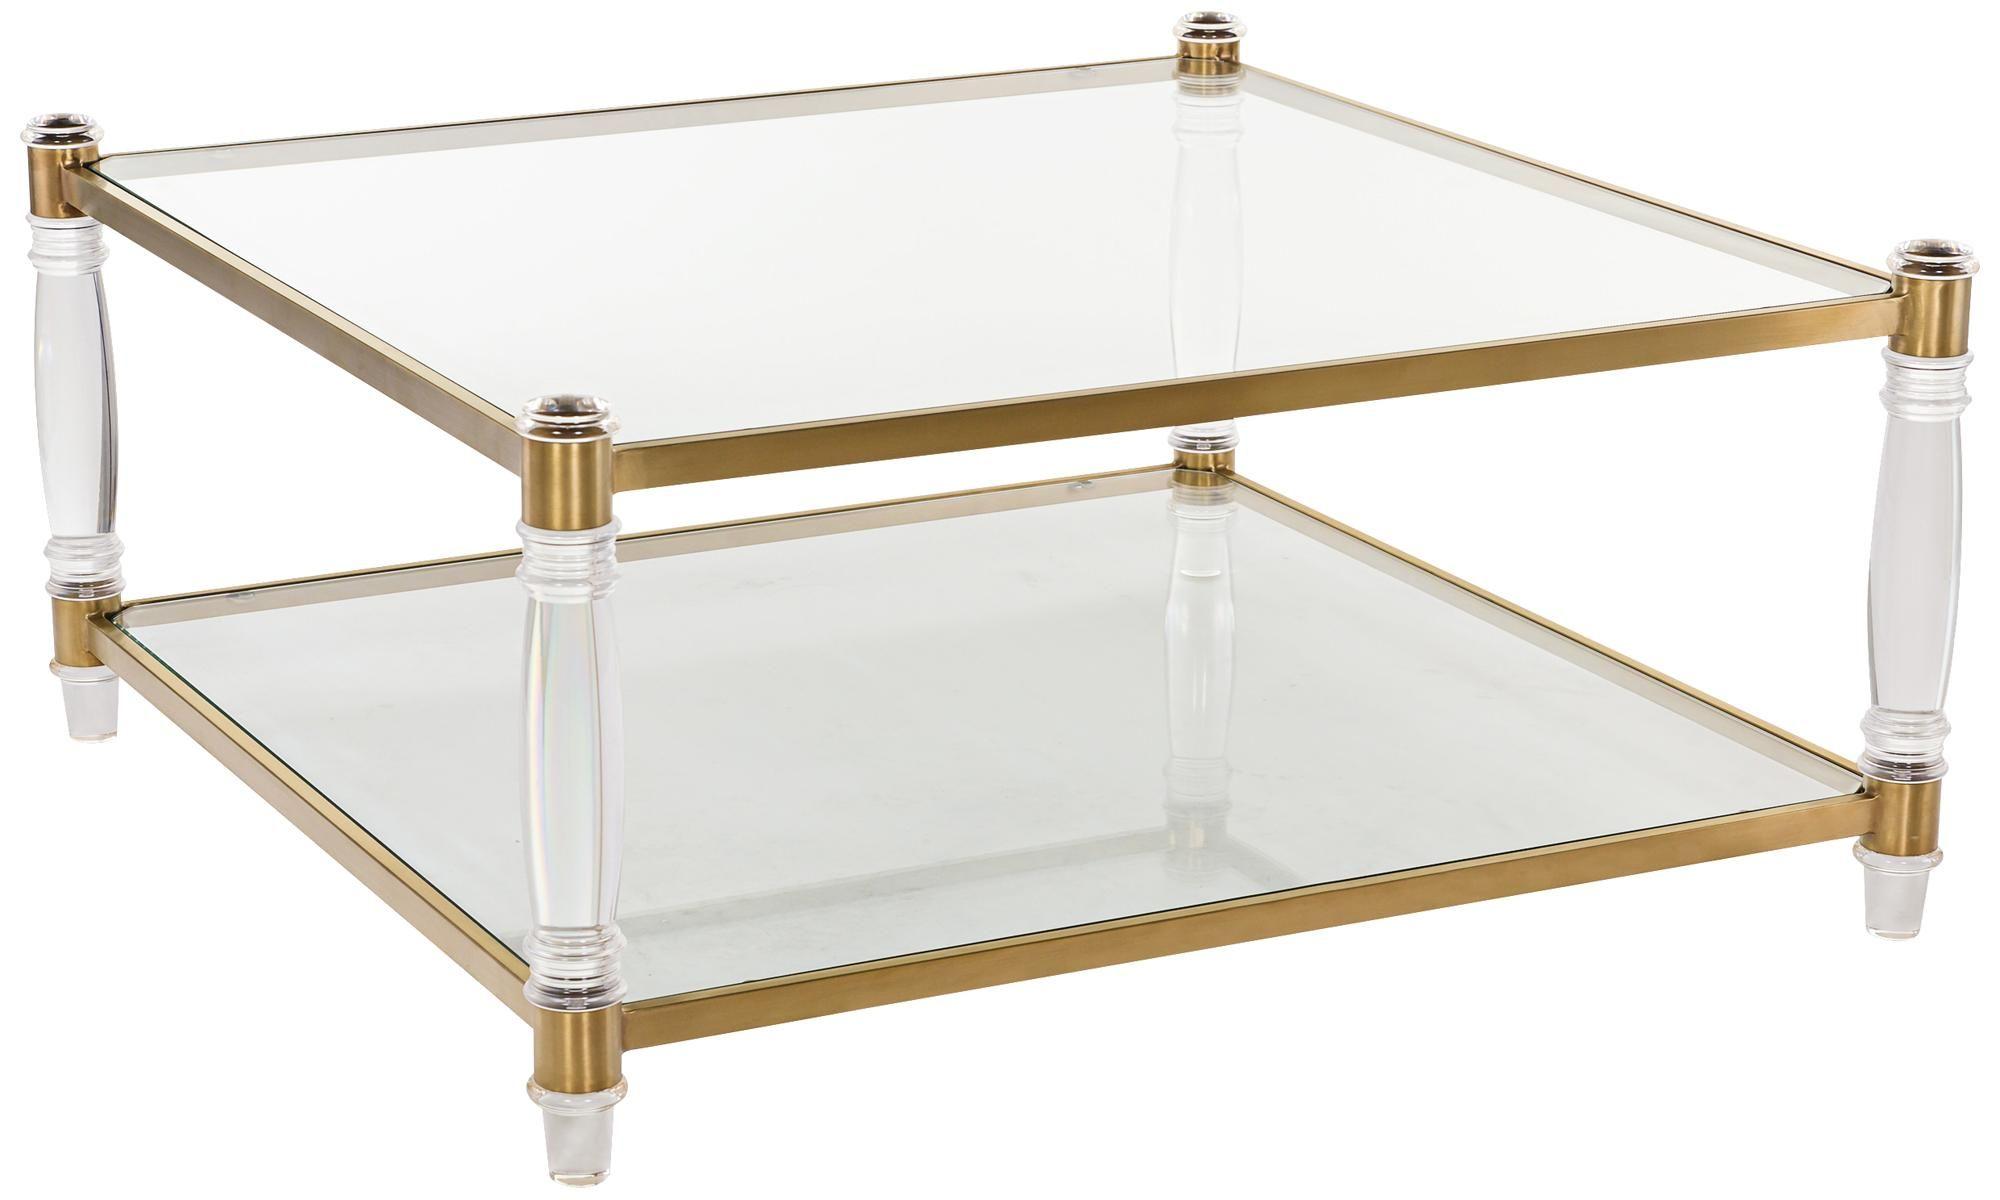 Isabelle Bronze Brass Square 2 Shelf Glass Coffee Table Acrylic Coffee Table Coffee Table Furniture [ 1200 x 2000 Pixel ]